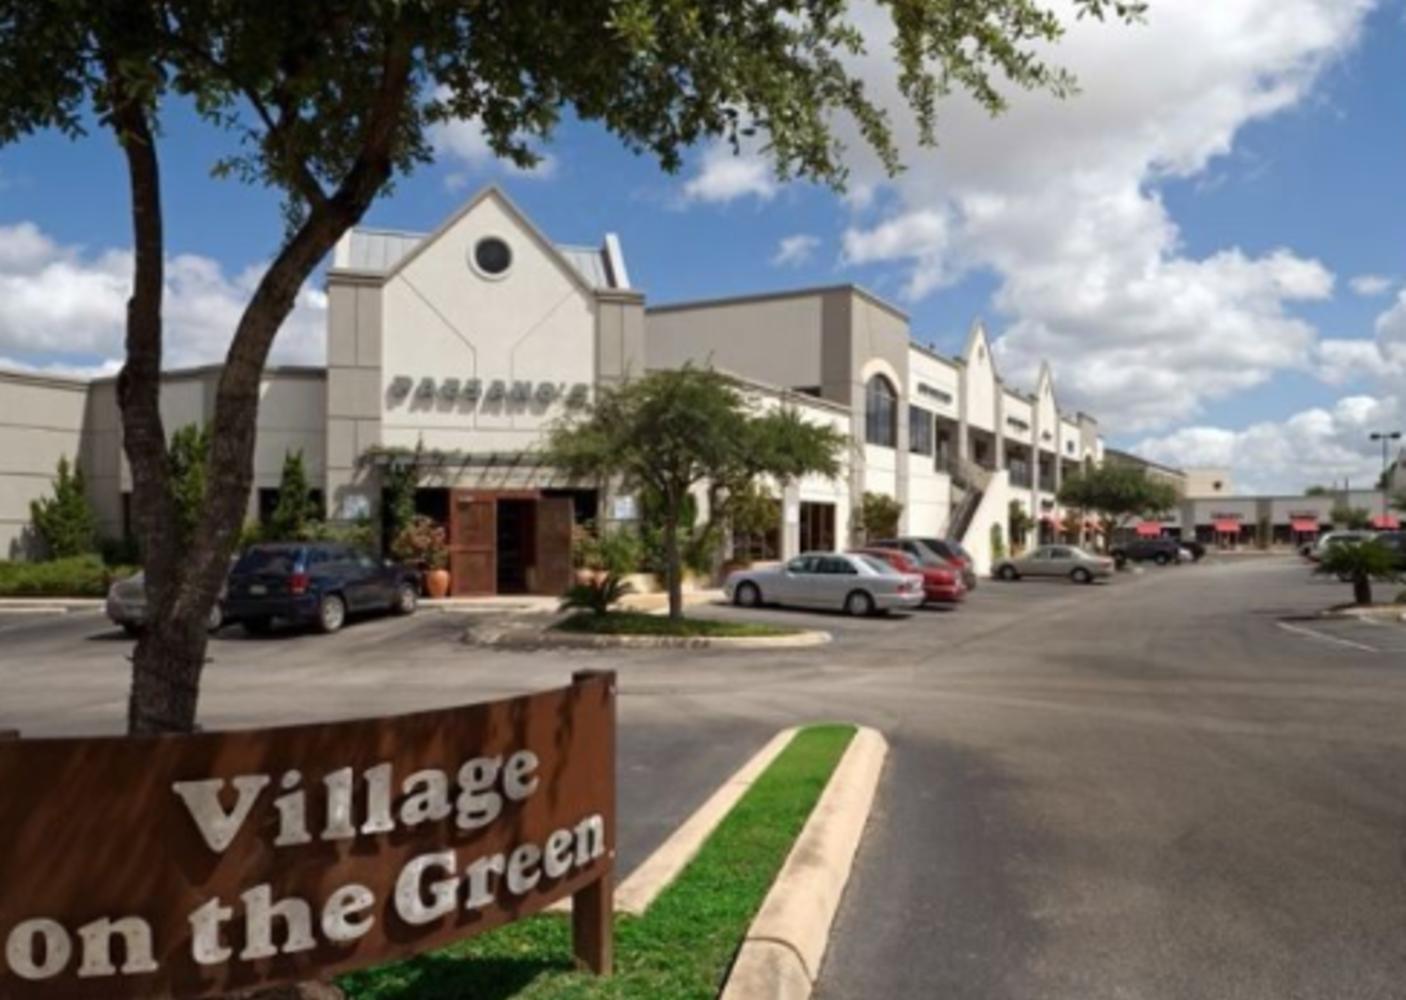 Retail San antonio, 78209-8353 - Village on the Green